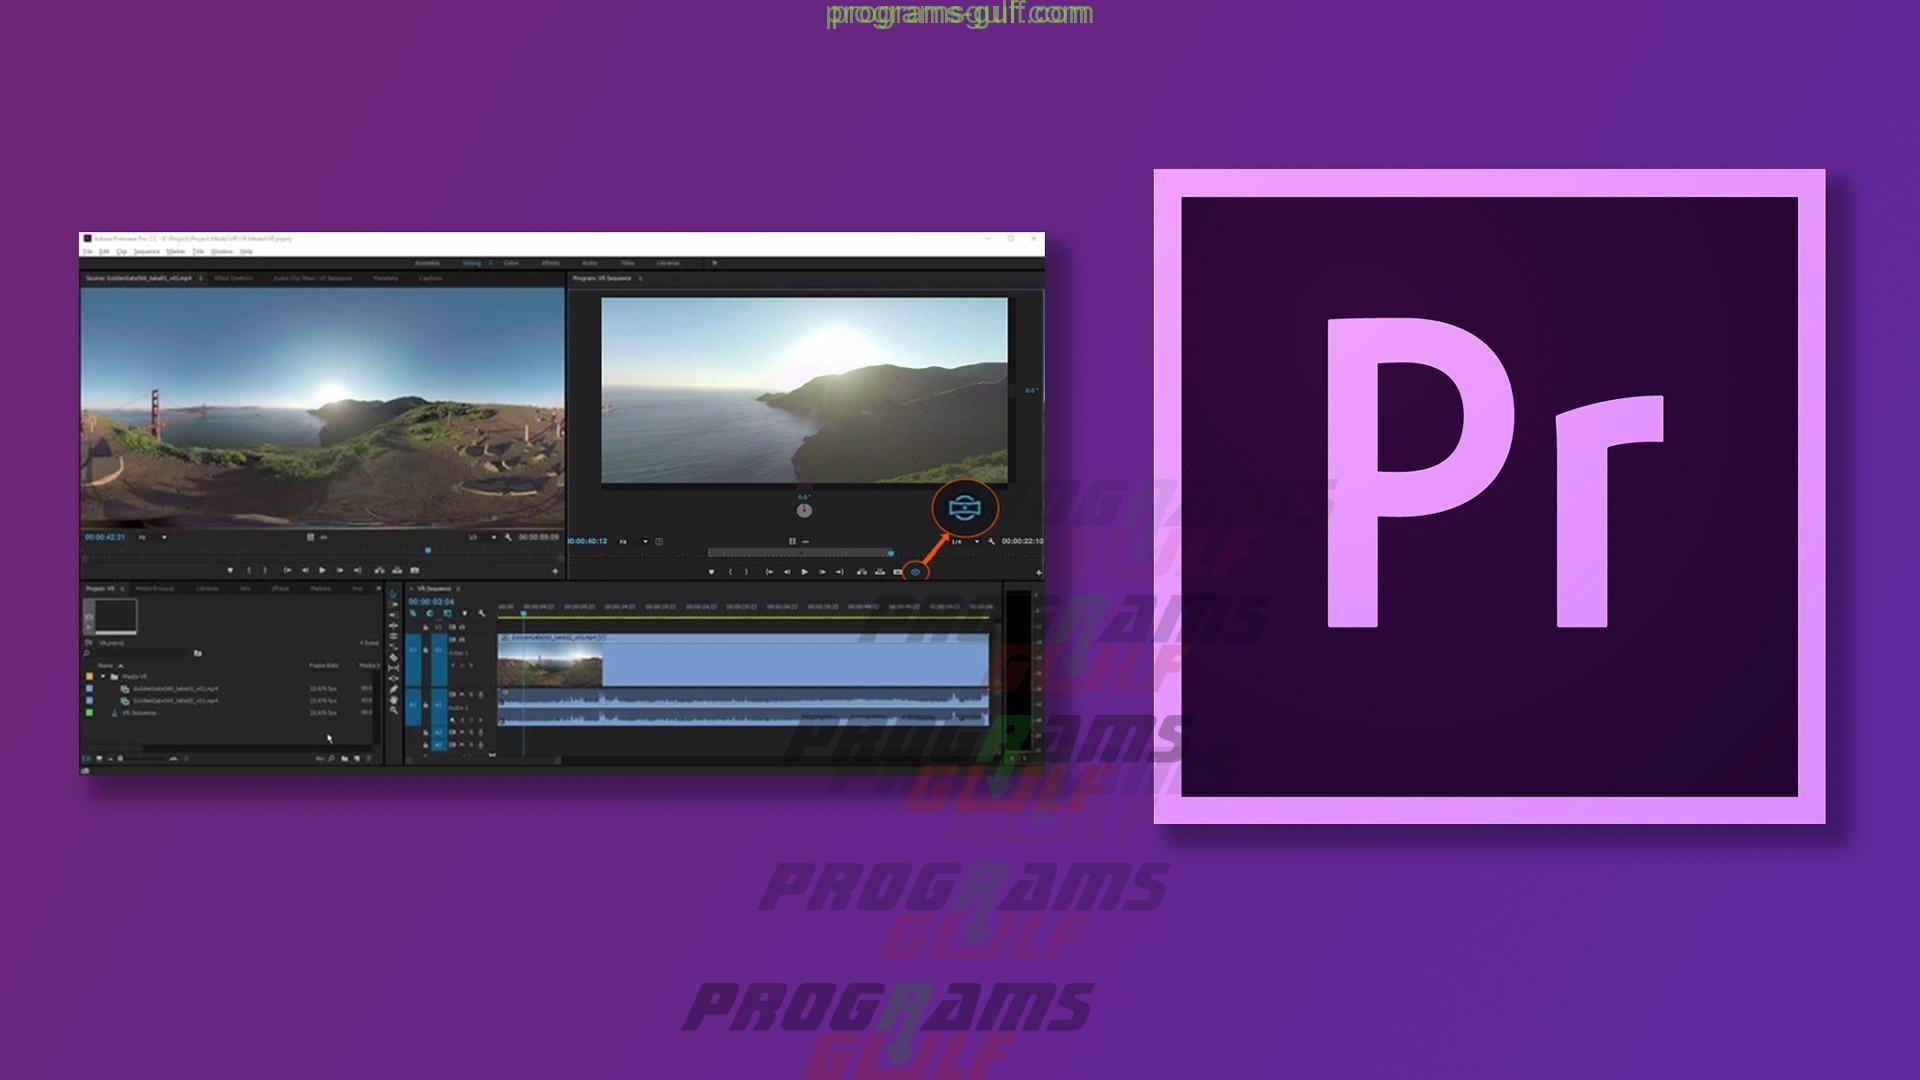 برنامج Adobe Premiere Pro